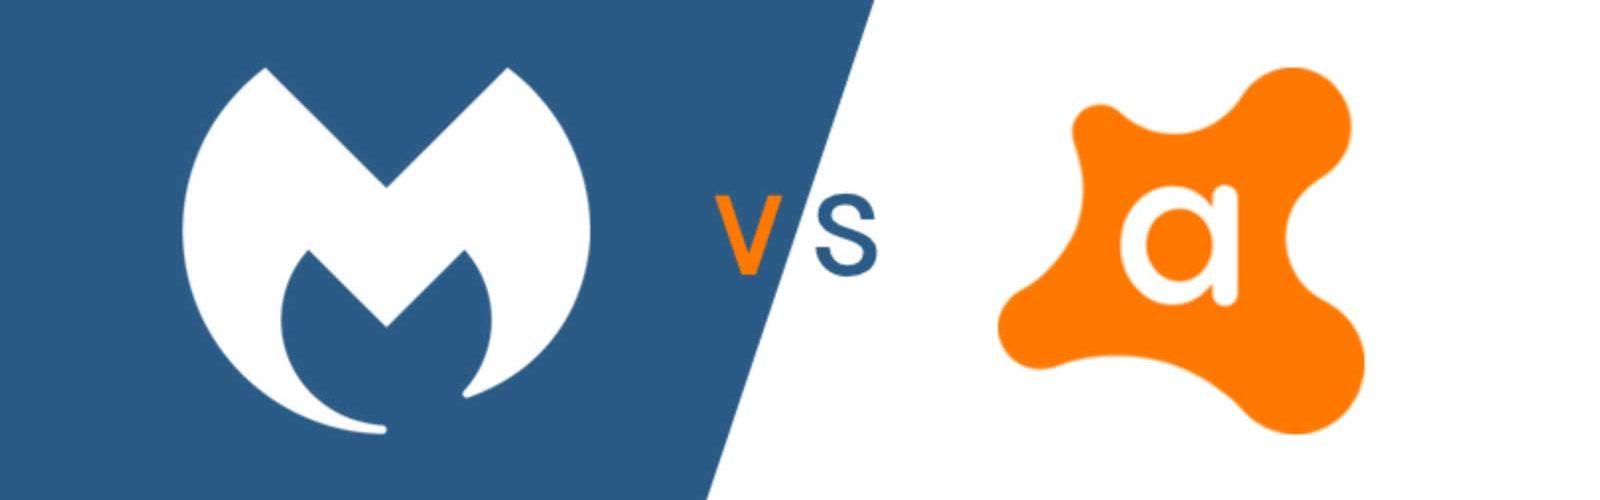 Avast vs. Malwarebytes